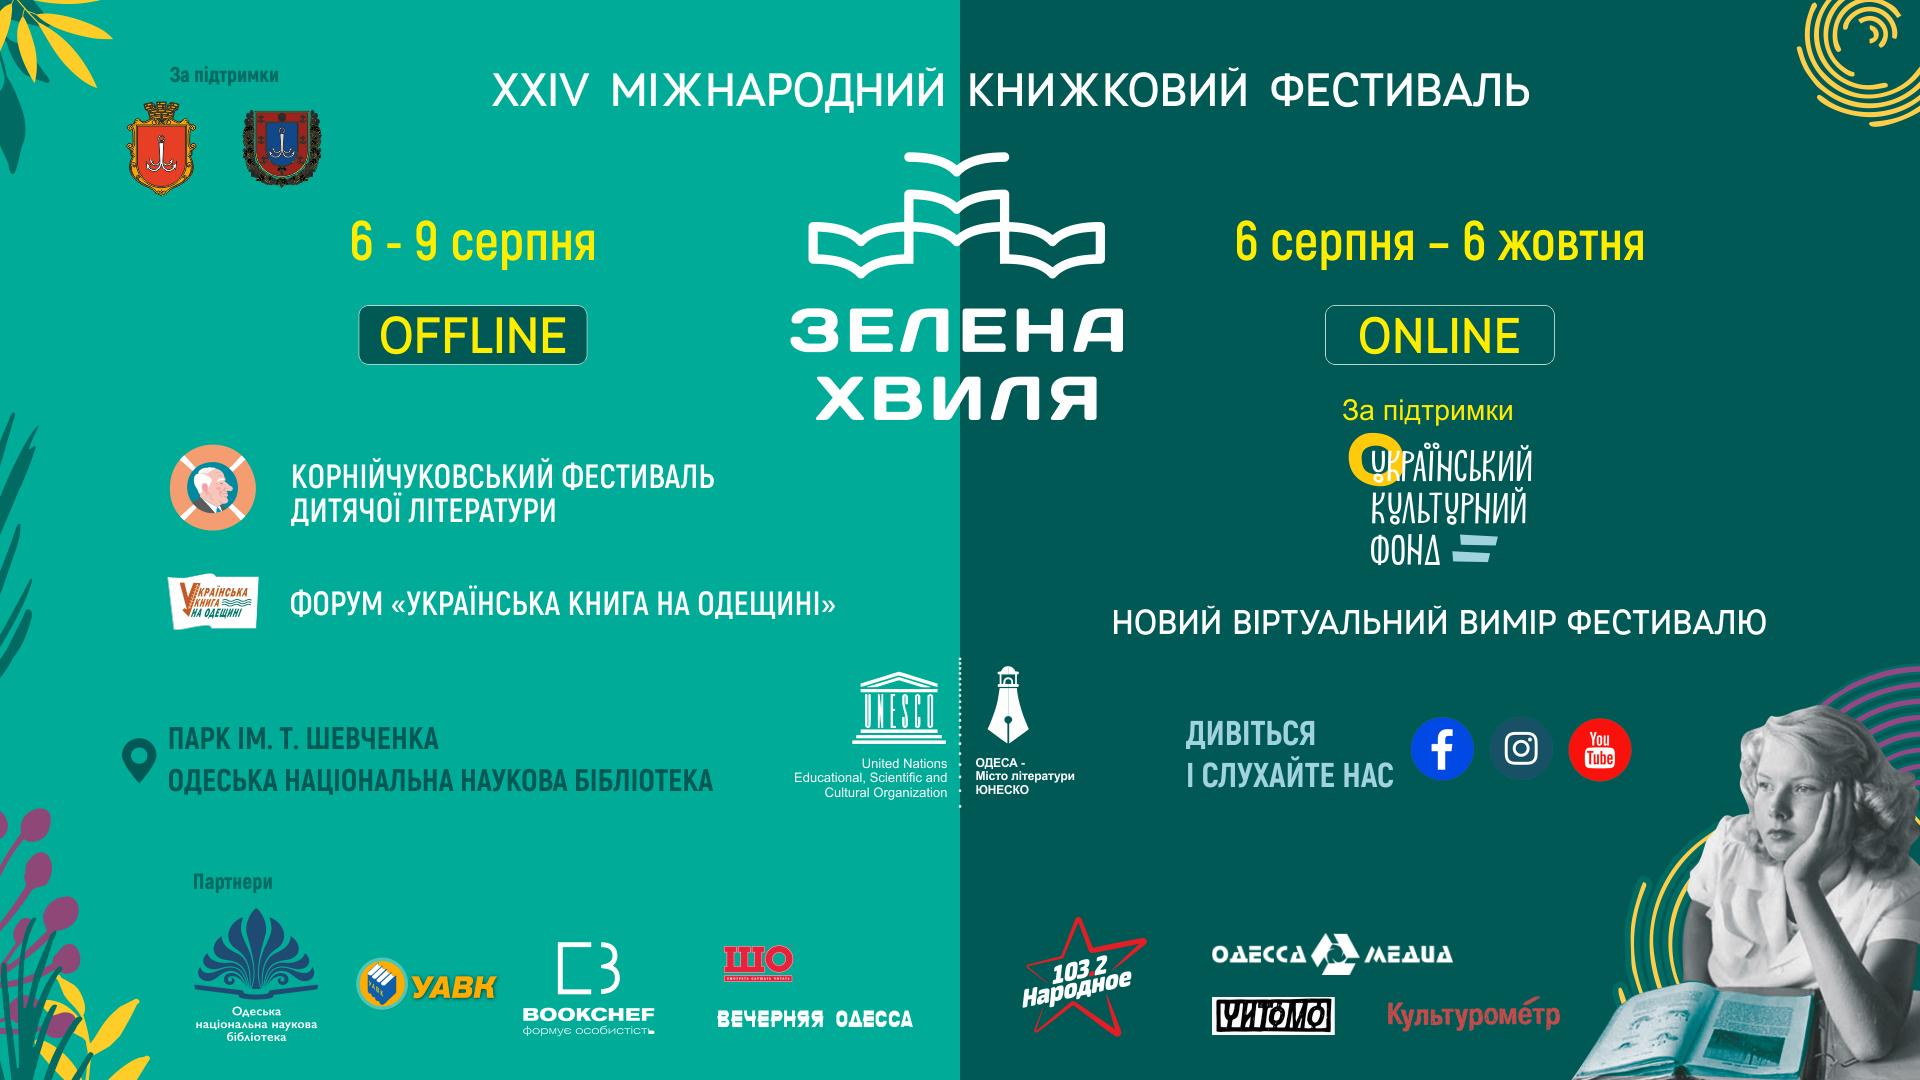 Фестиваль «Зелена хвиля» онлайн